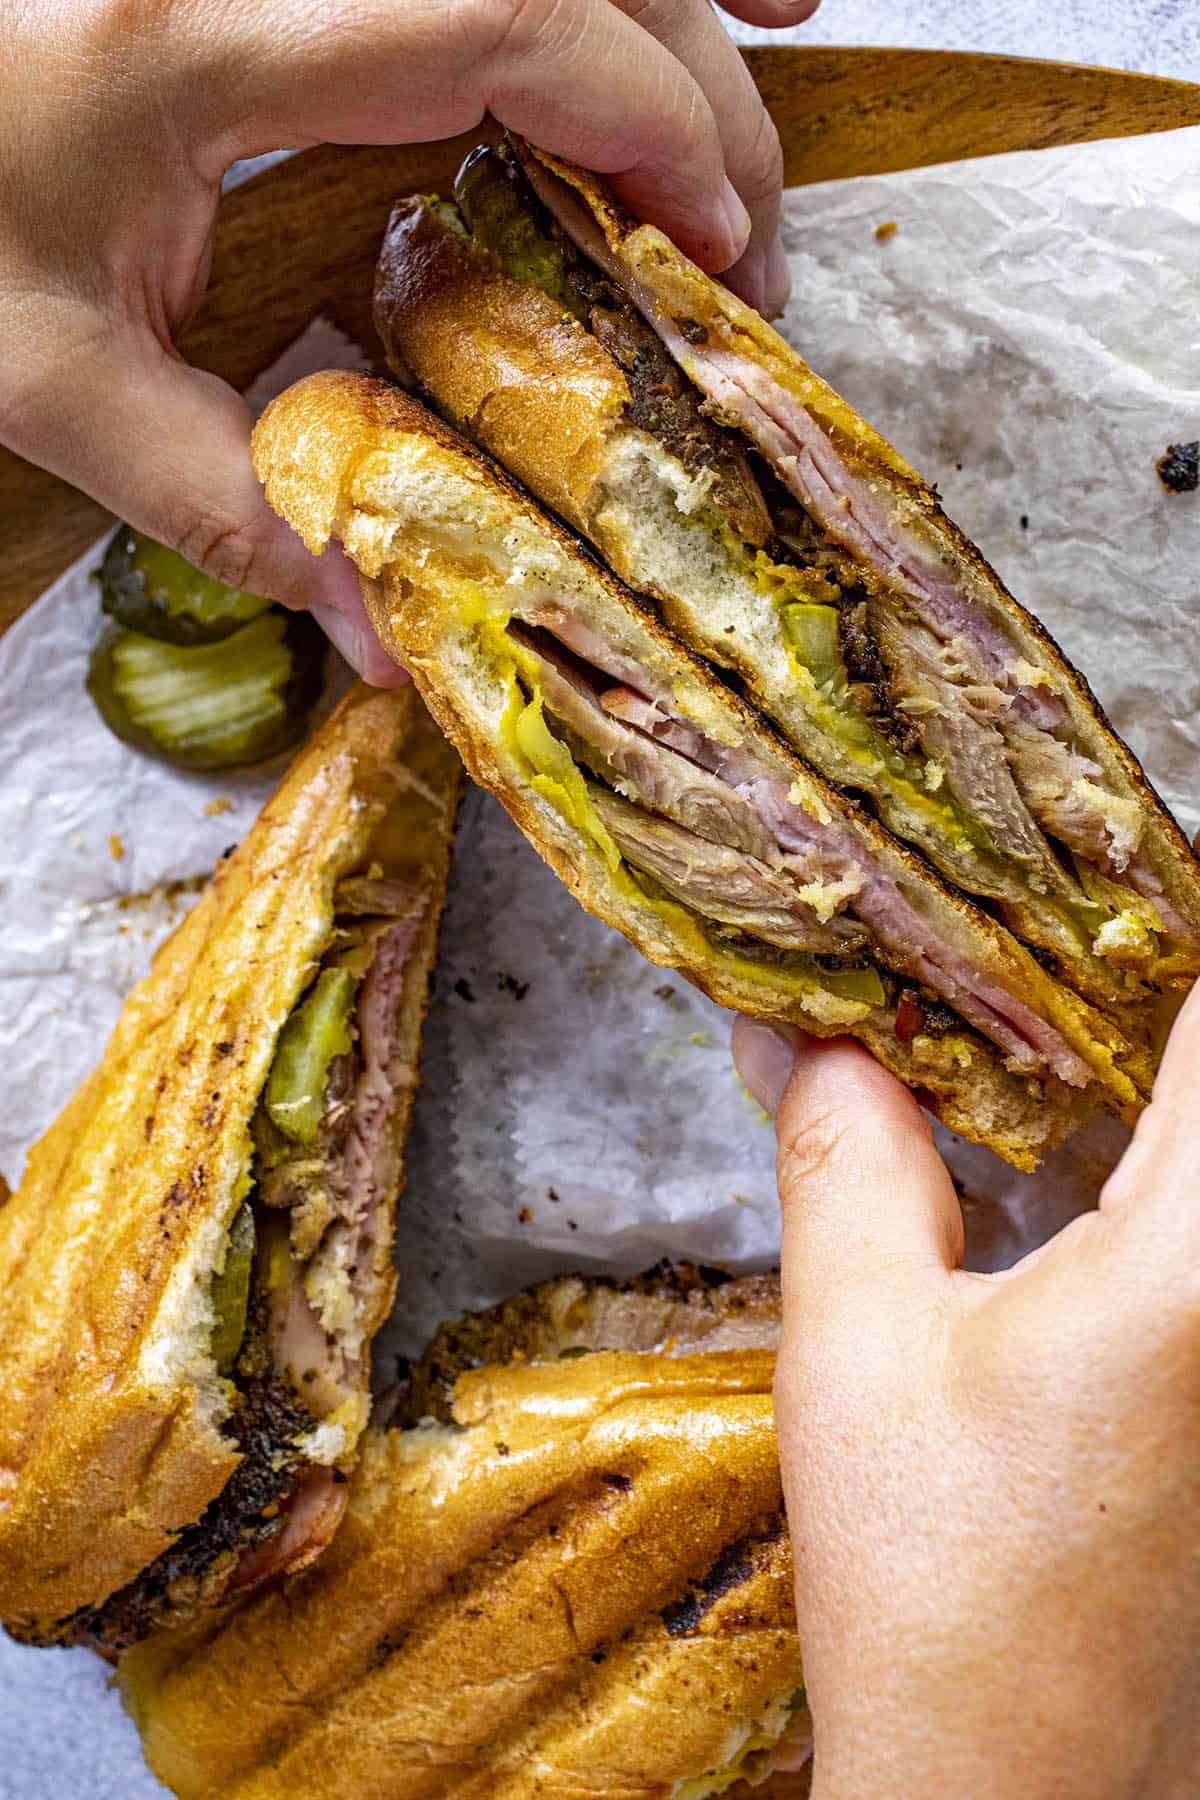 Mike holding a Cuban Sandwich